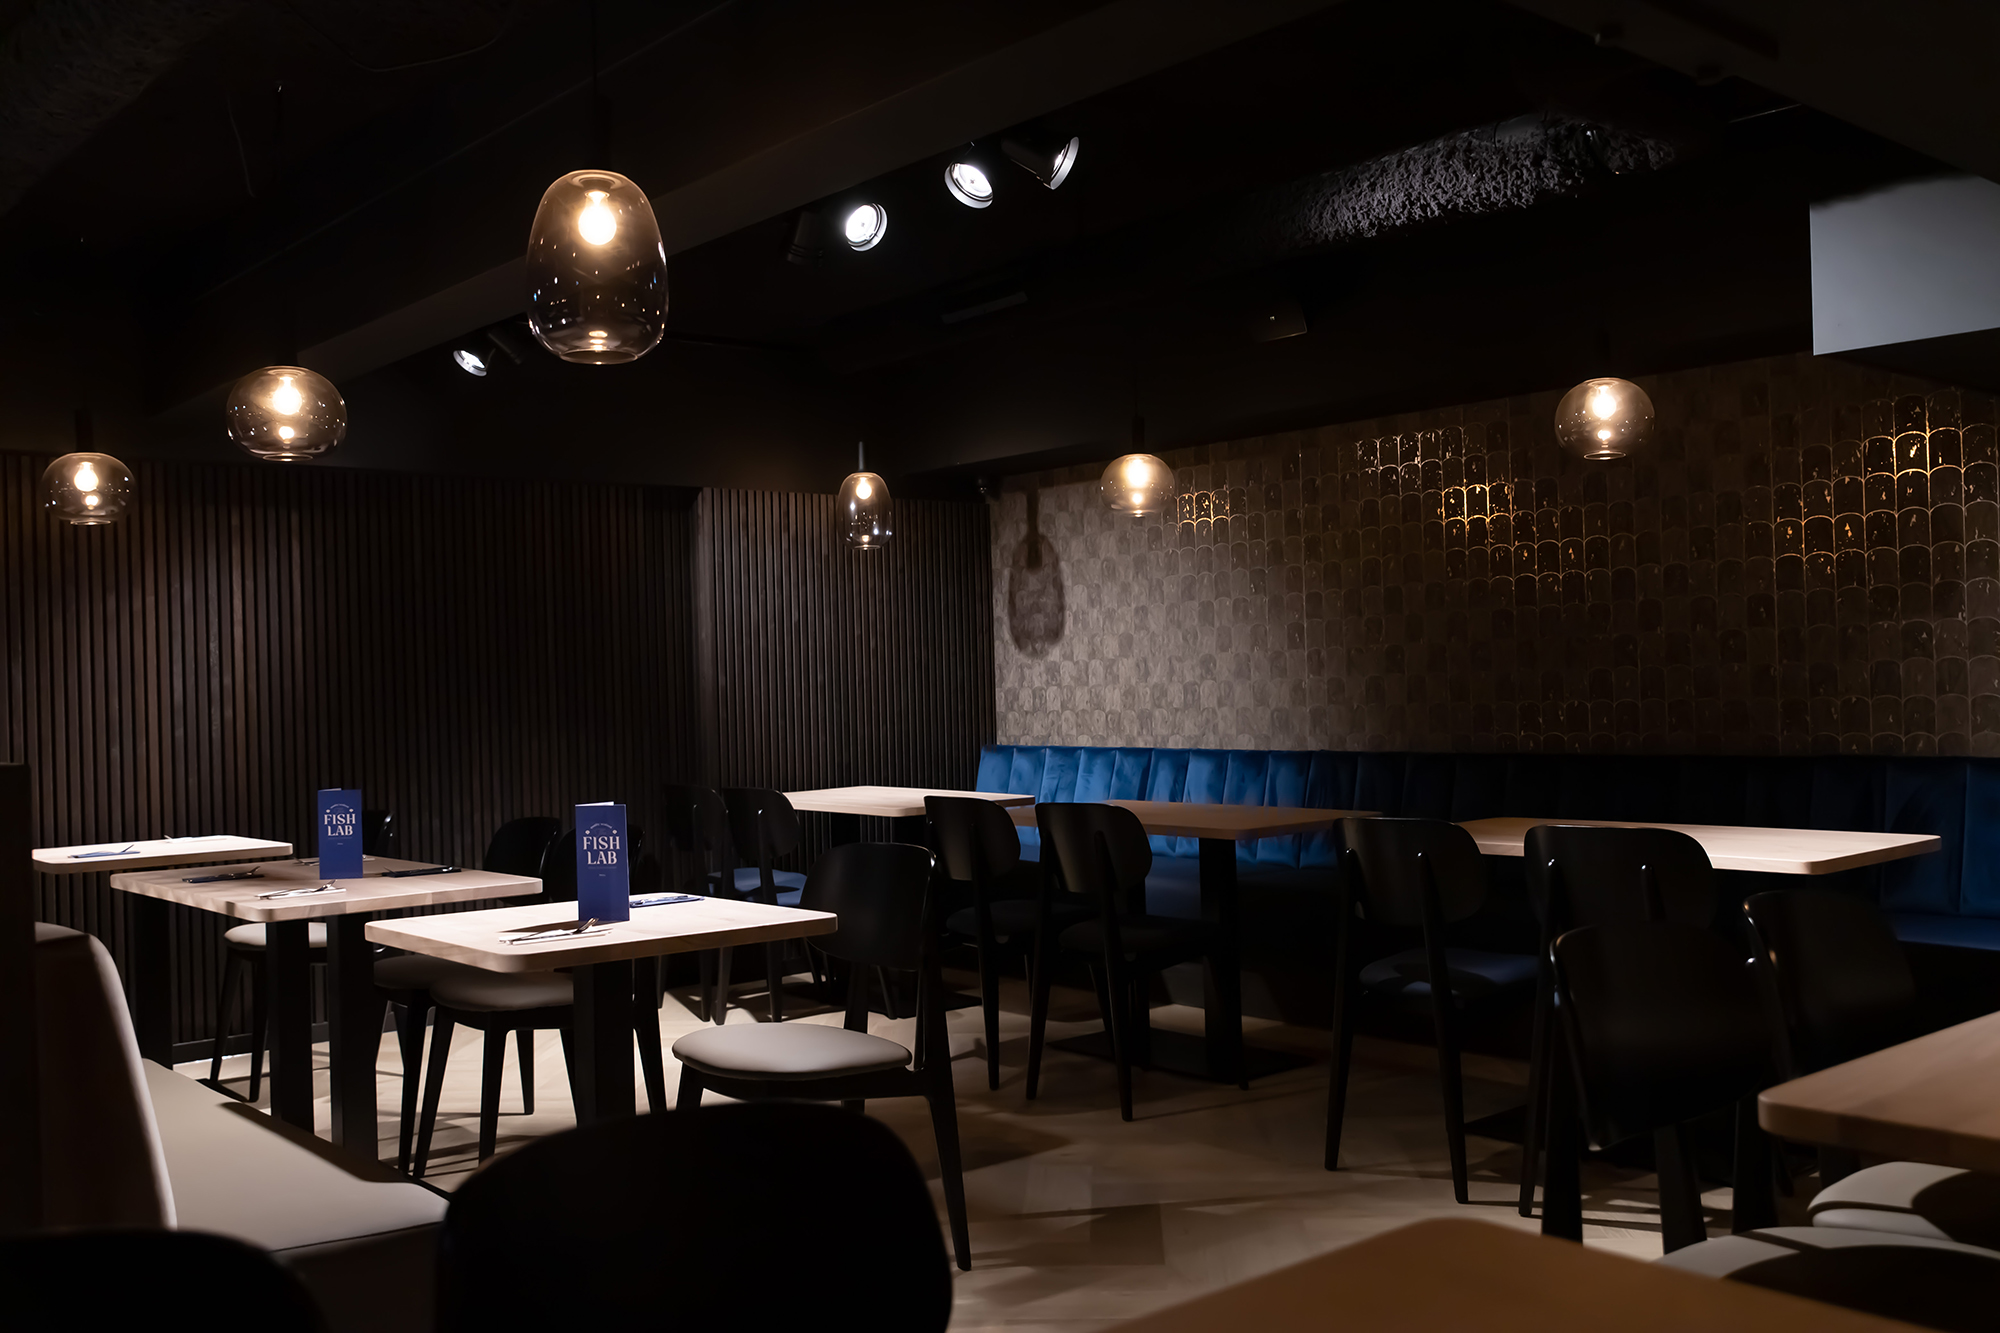 Thefishlab-visrestaurant-rotterdam-goudsesingel